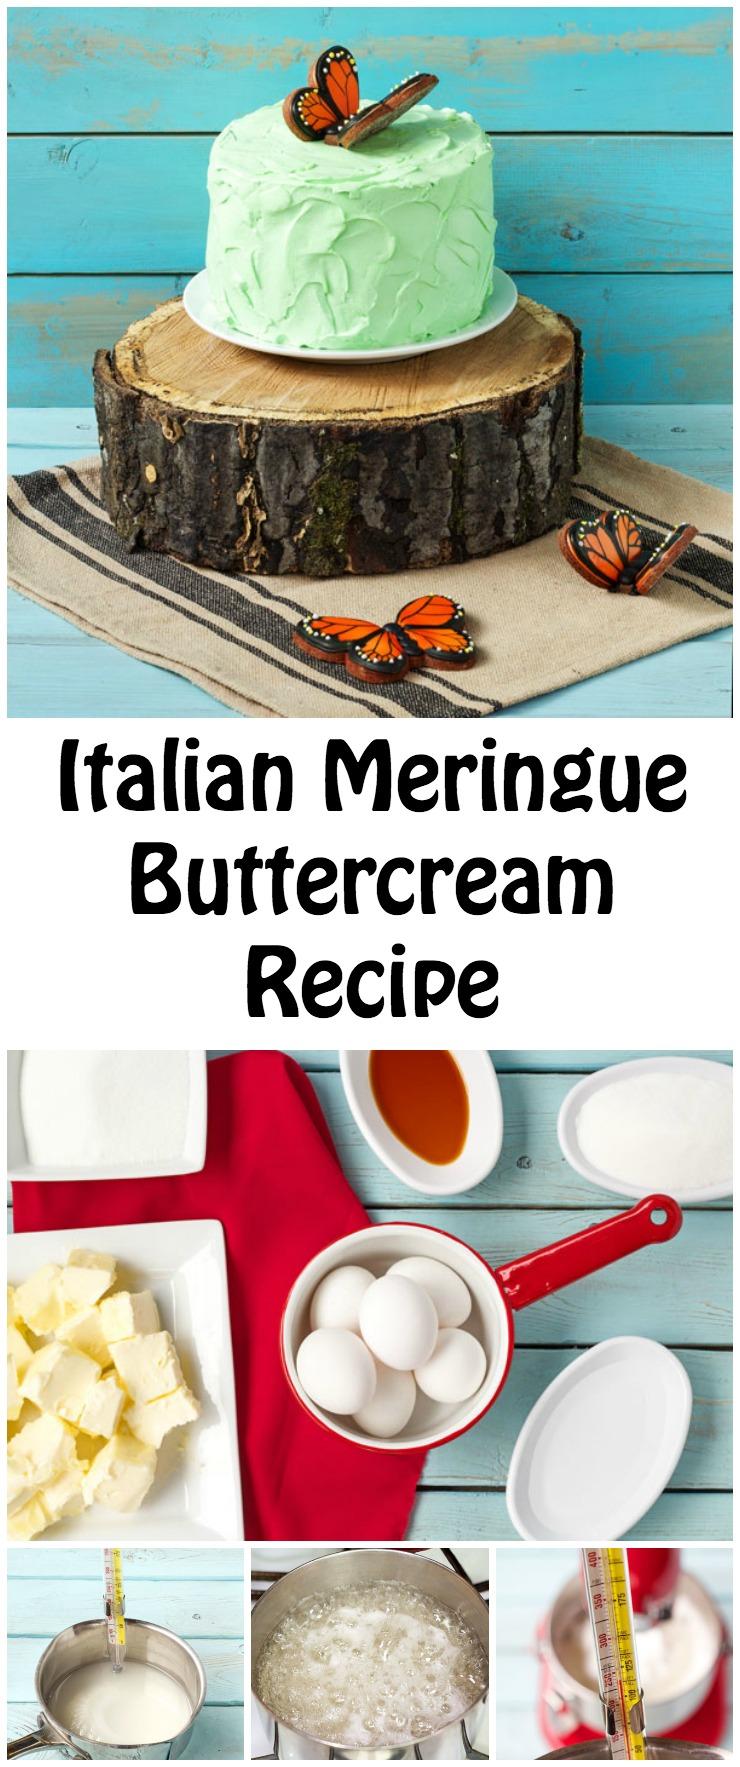 How to Make Italian Meringue Buttercream Recipe www.thebearfootbaker.com